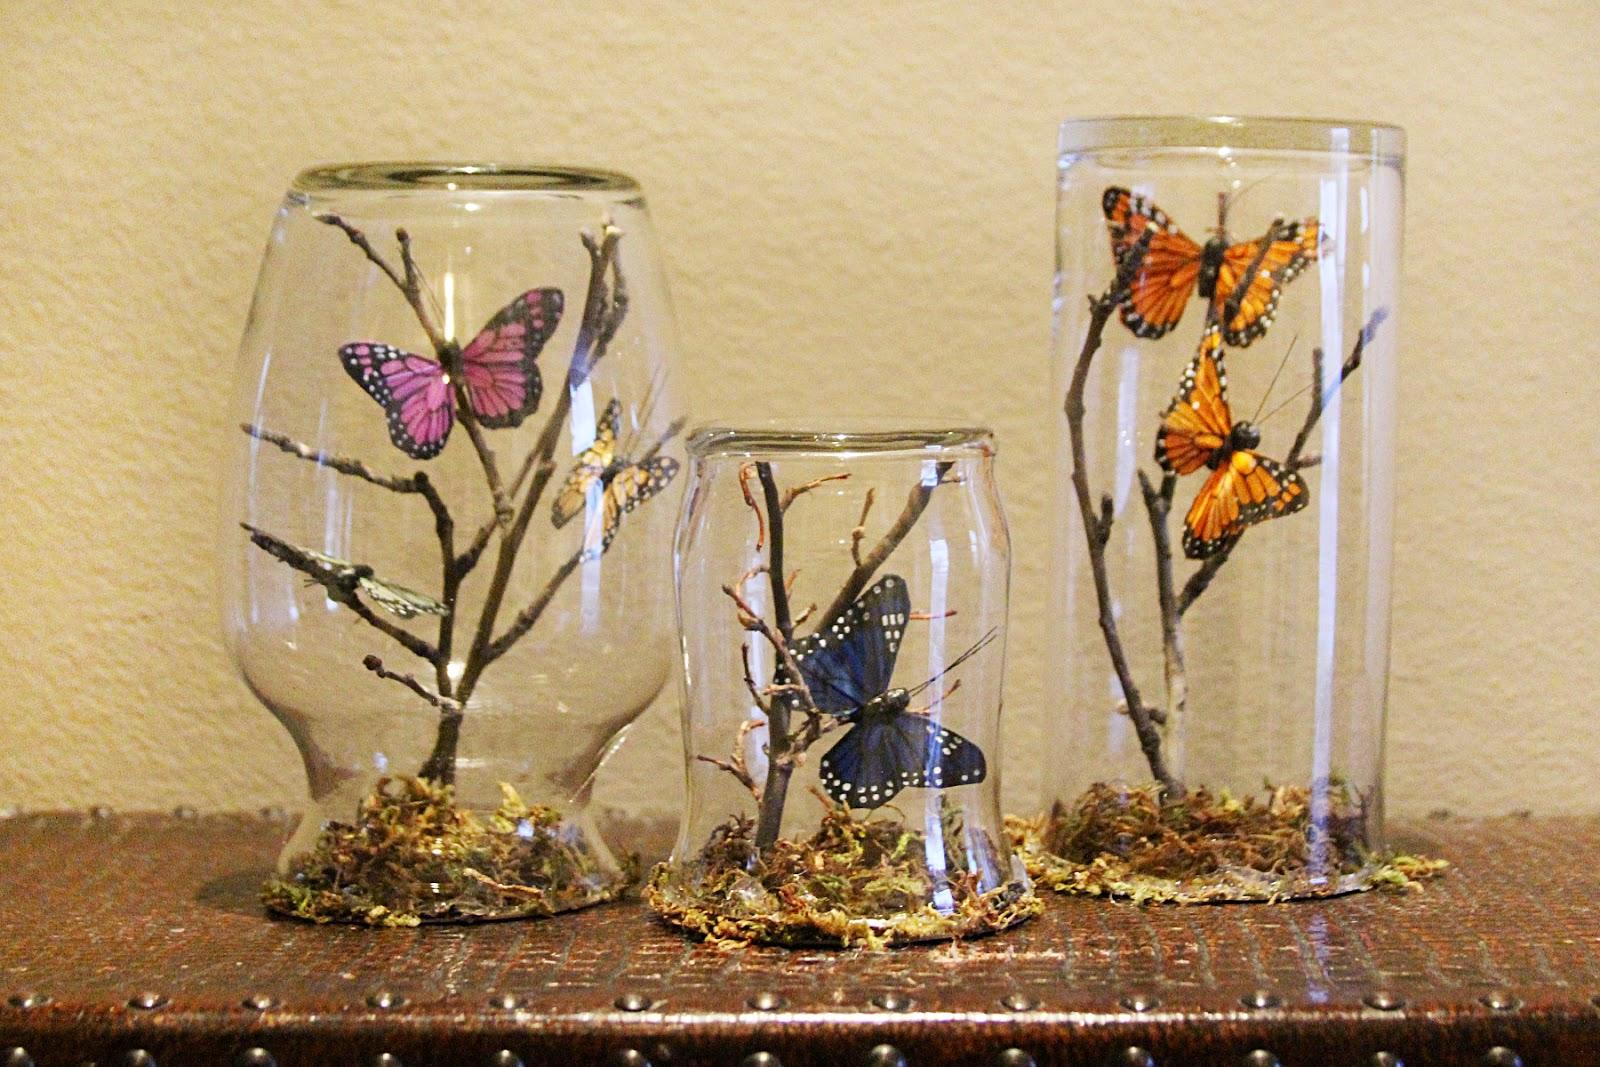 Manualidades frascos para decorar el hogar - Manualidades para decorar el hogar ...